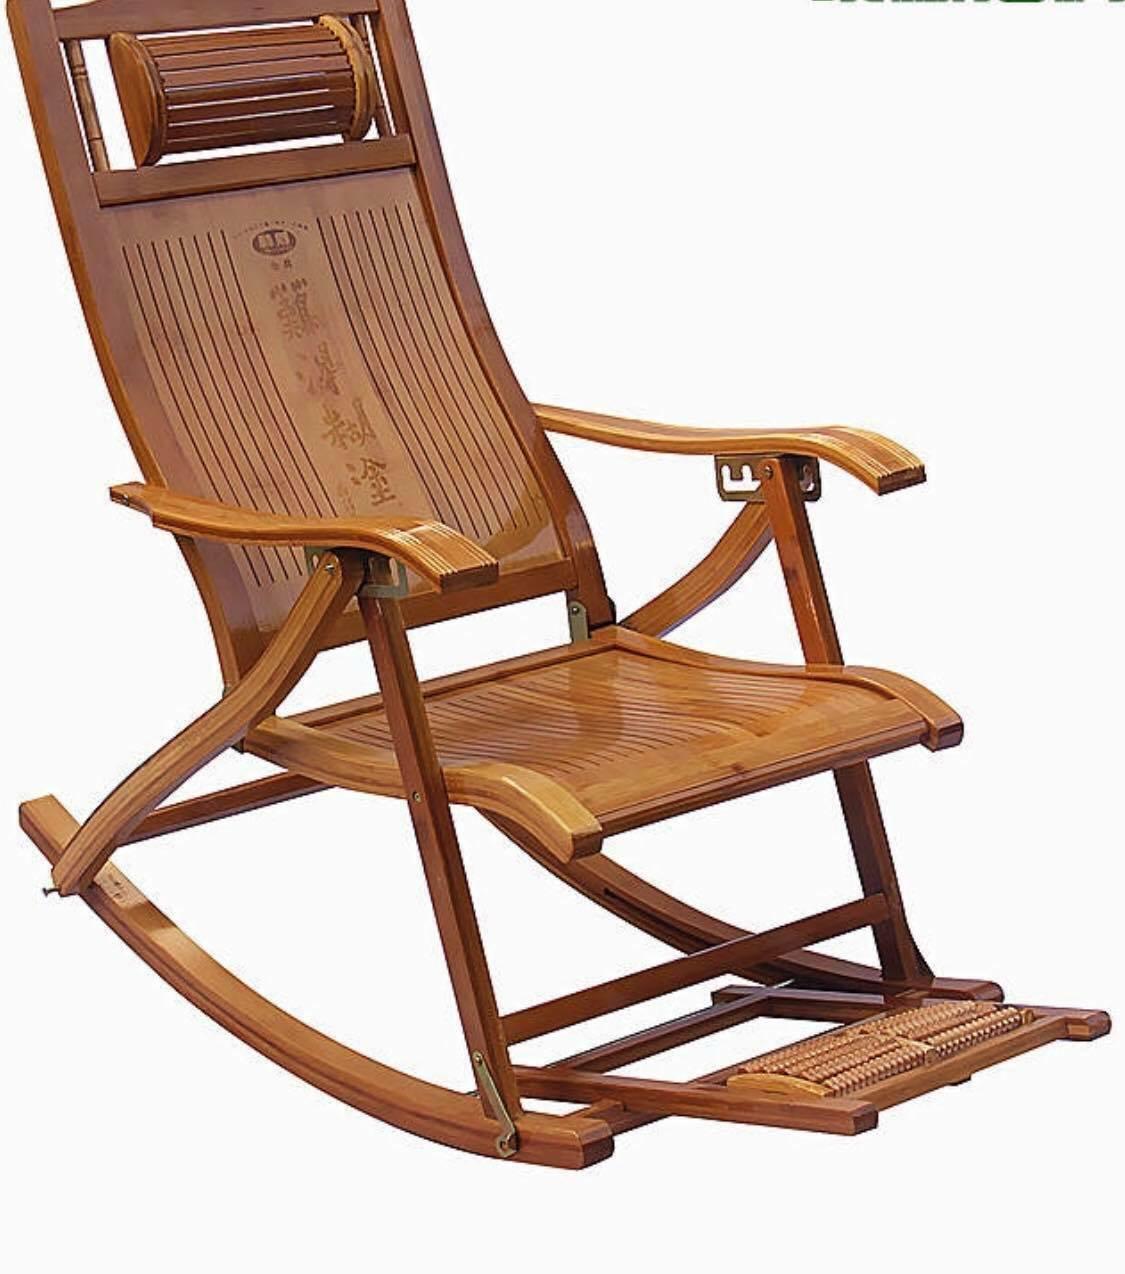 Mecedora Ajustable De Bambú Con Masajeador De Pies Relajante interior al aire libre